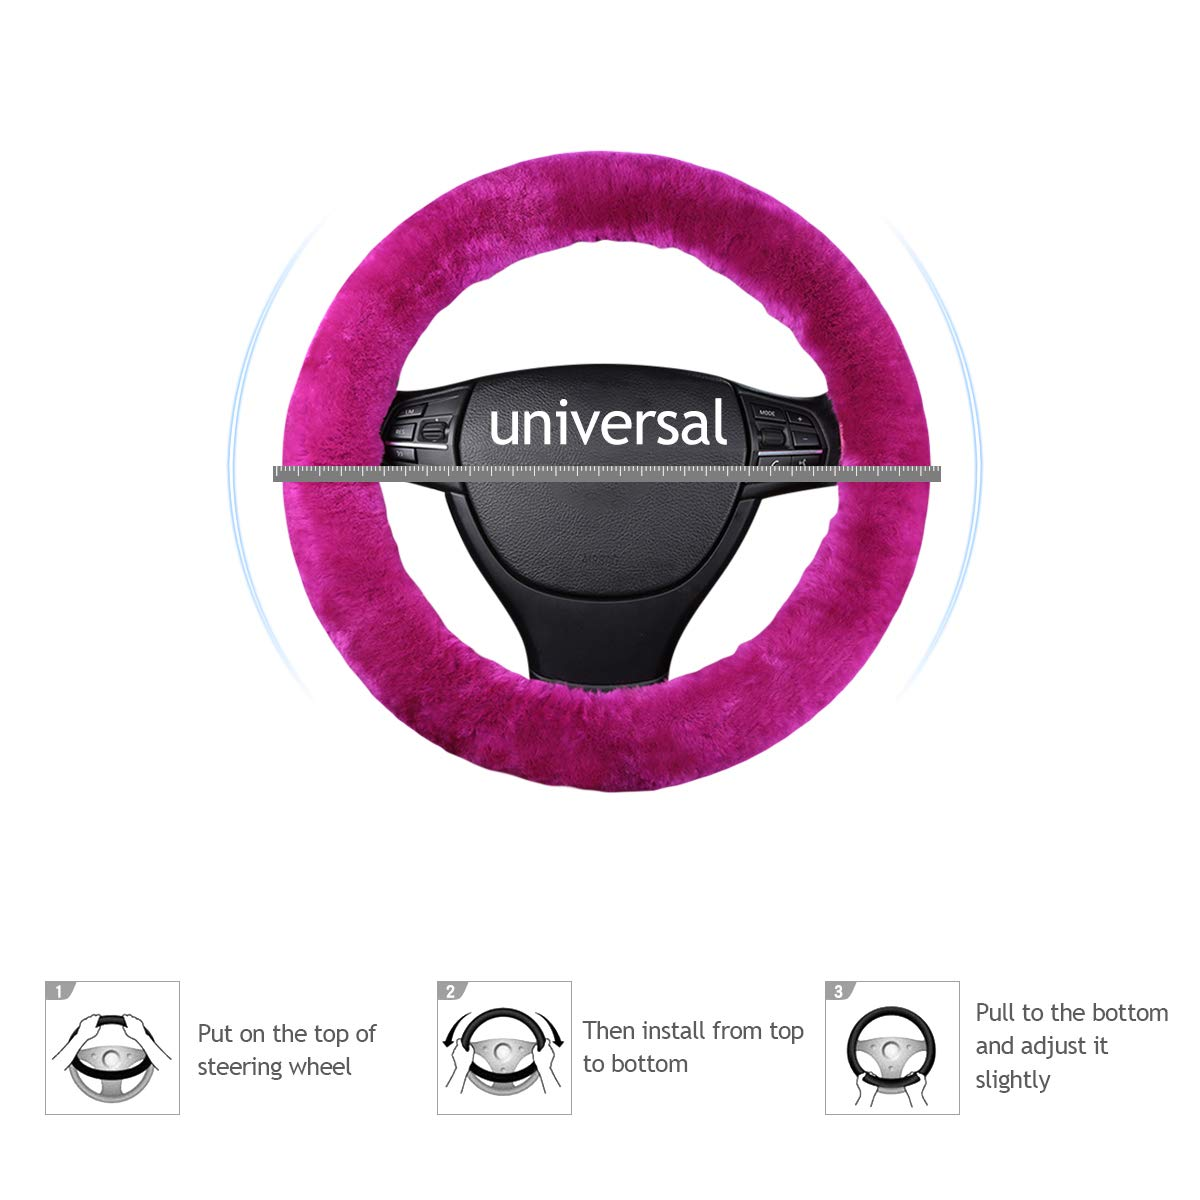 Ergocar weicher Auto-Lenkradbezug der reinen Wolle universeller rutschfester elastischer Winter warmer Autolenkradschutz Pink